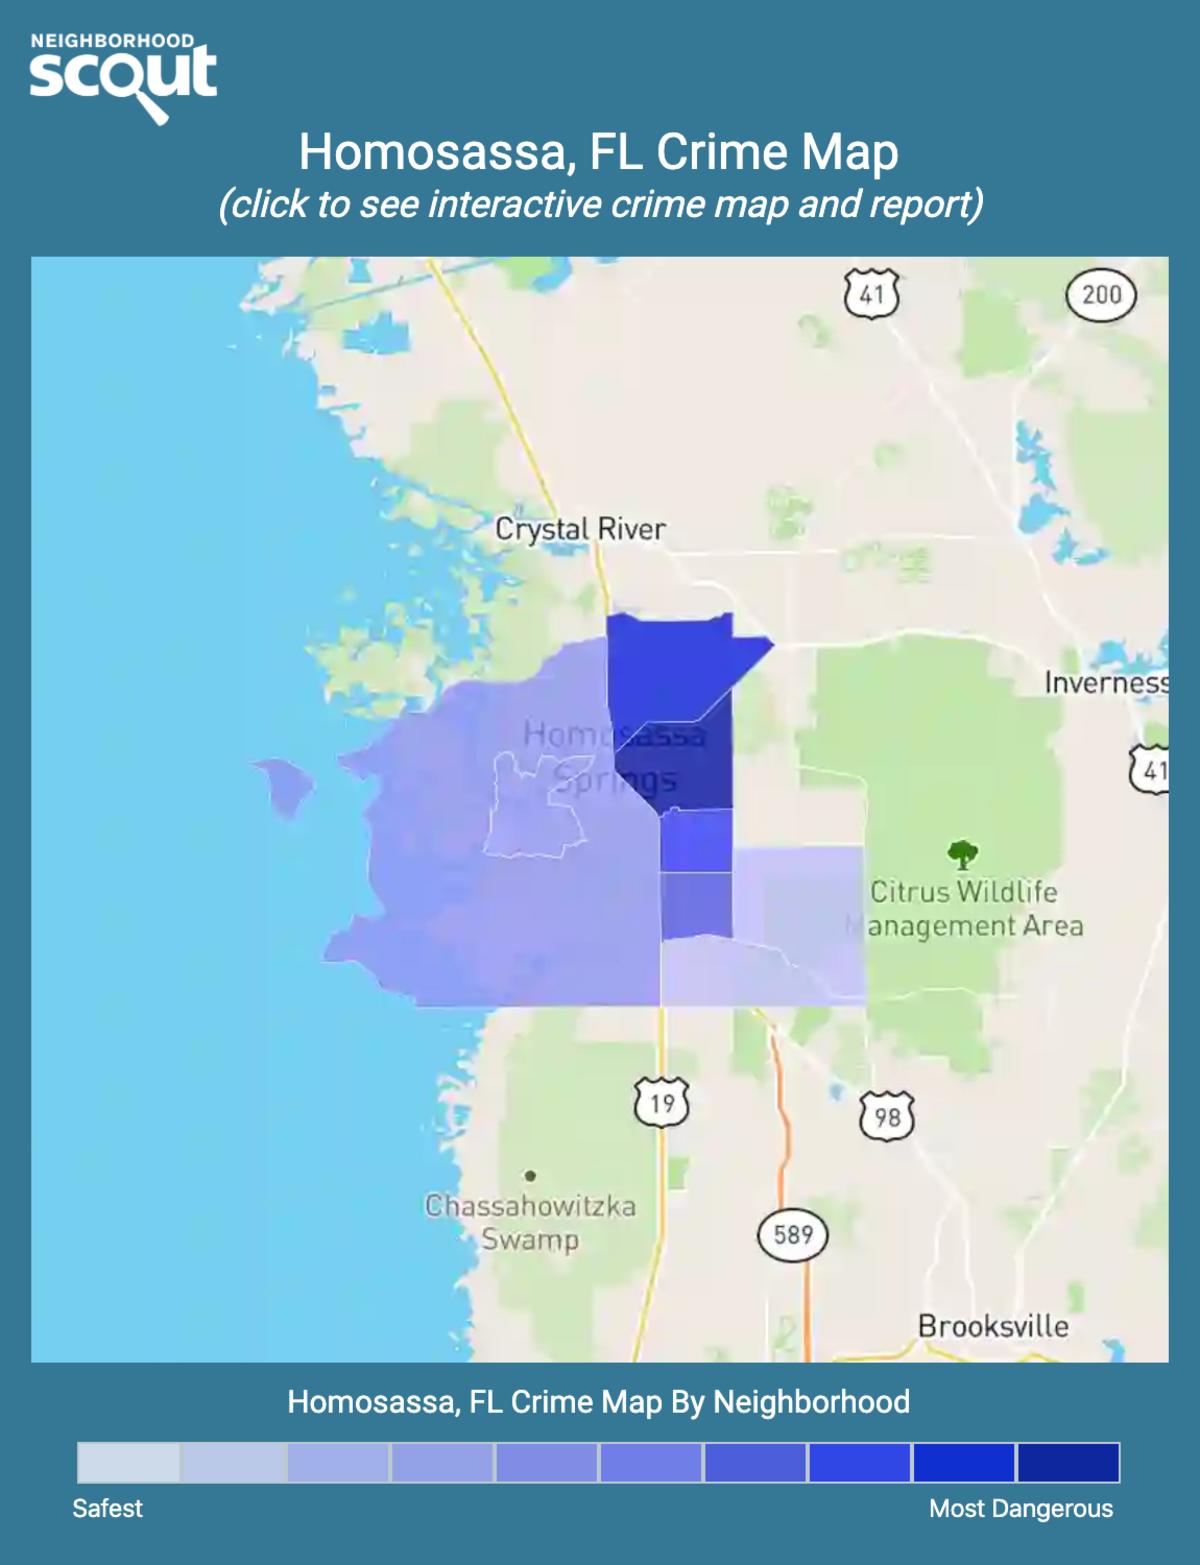 Homosassa, Florida crime map